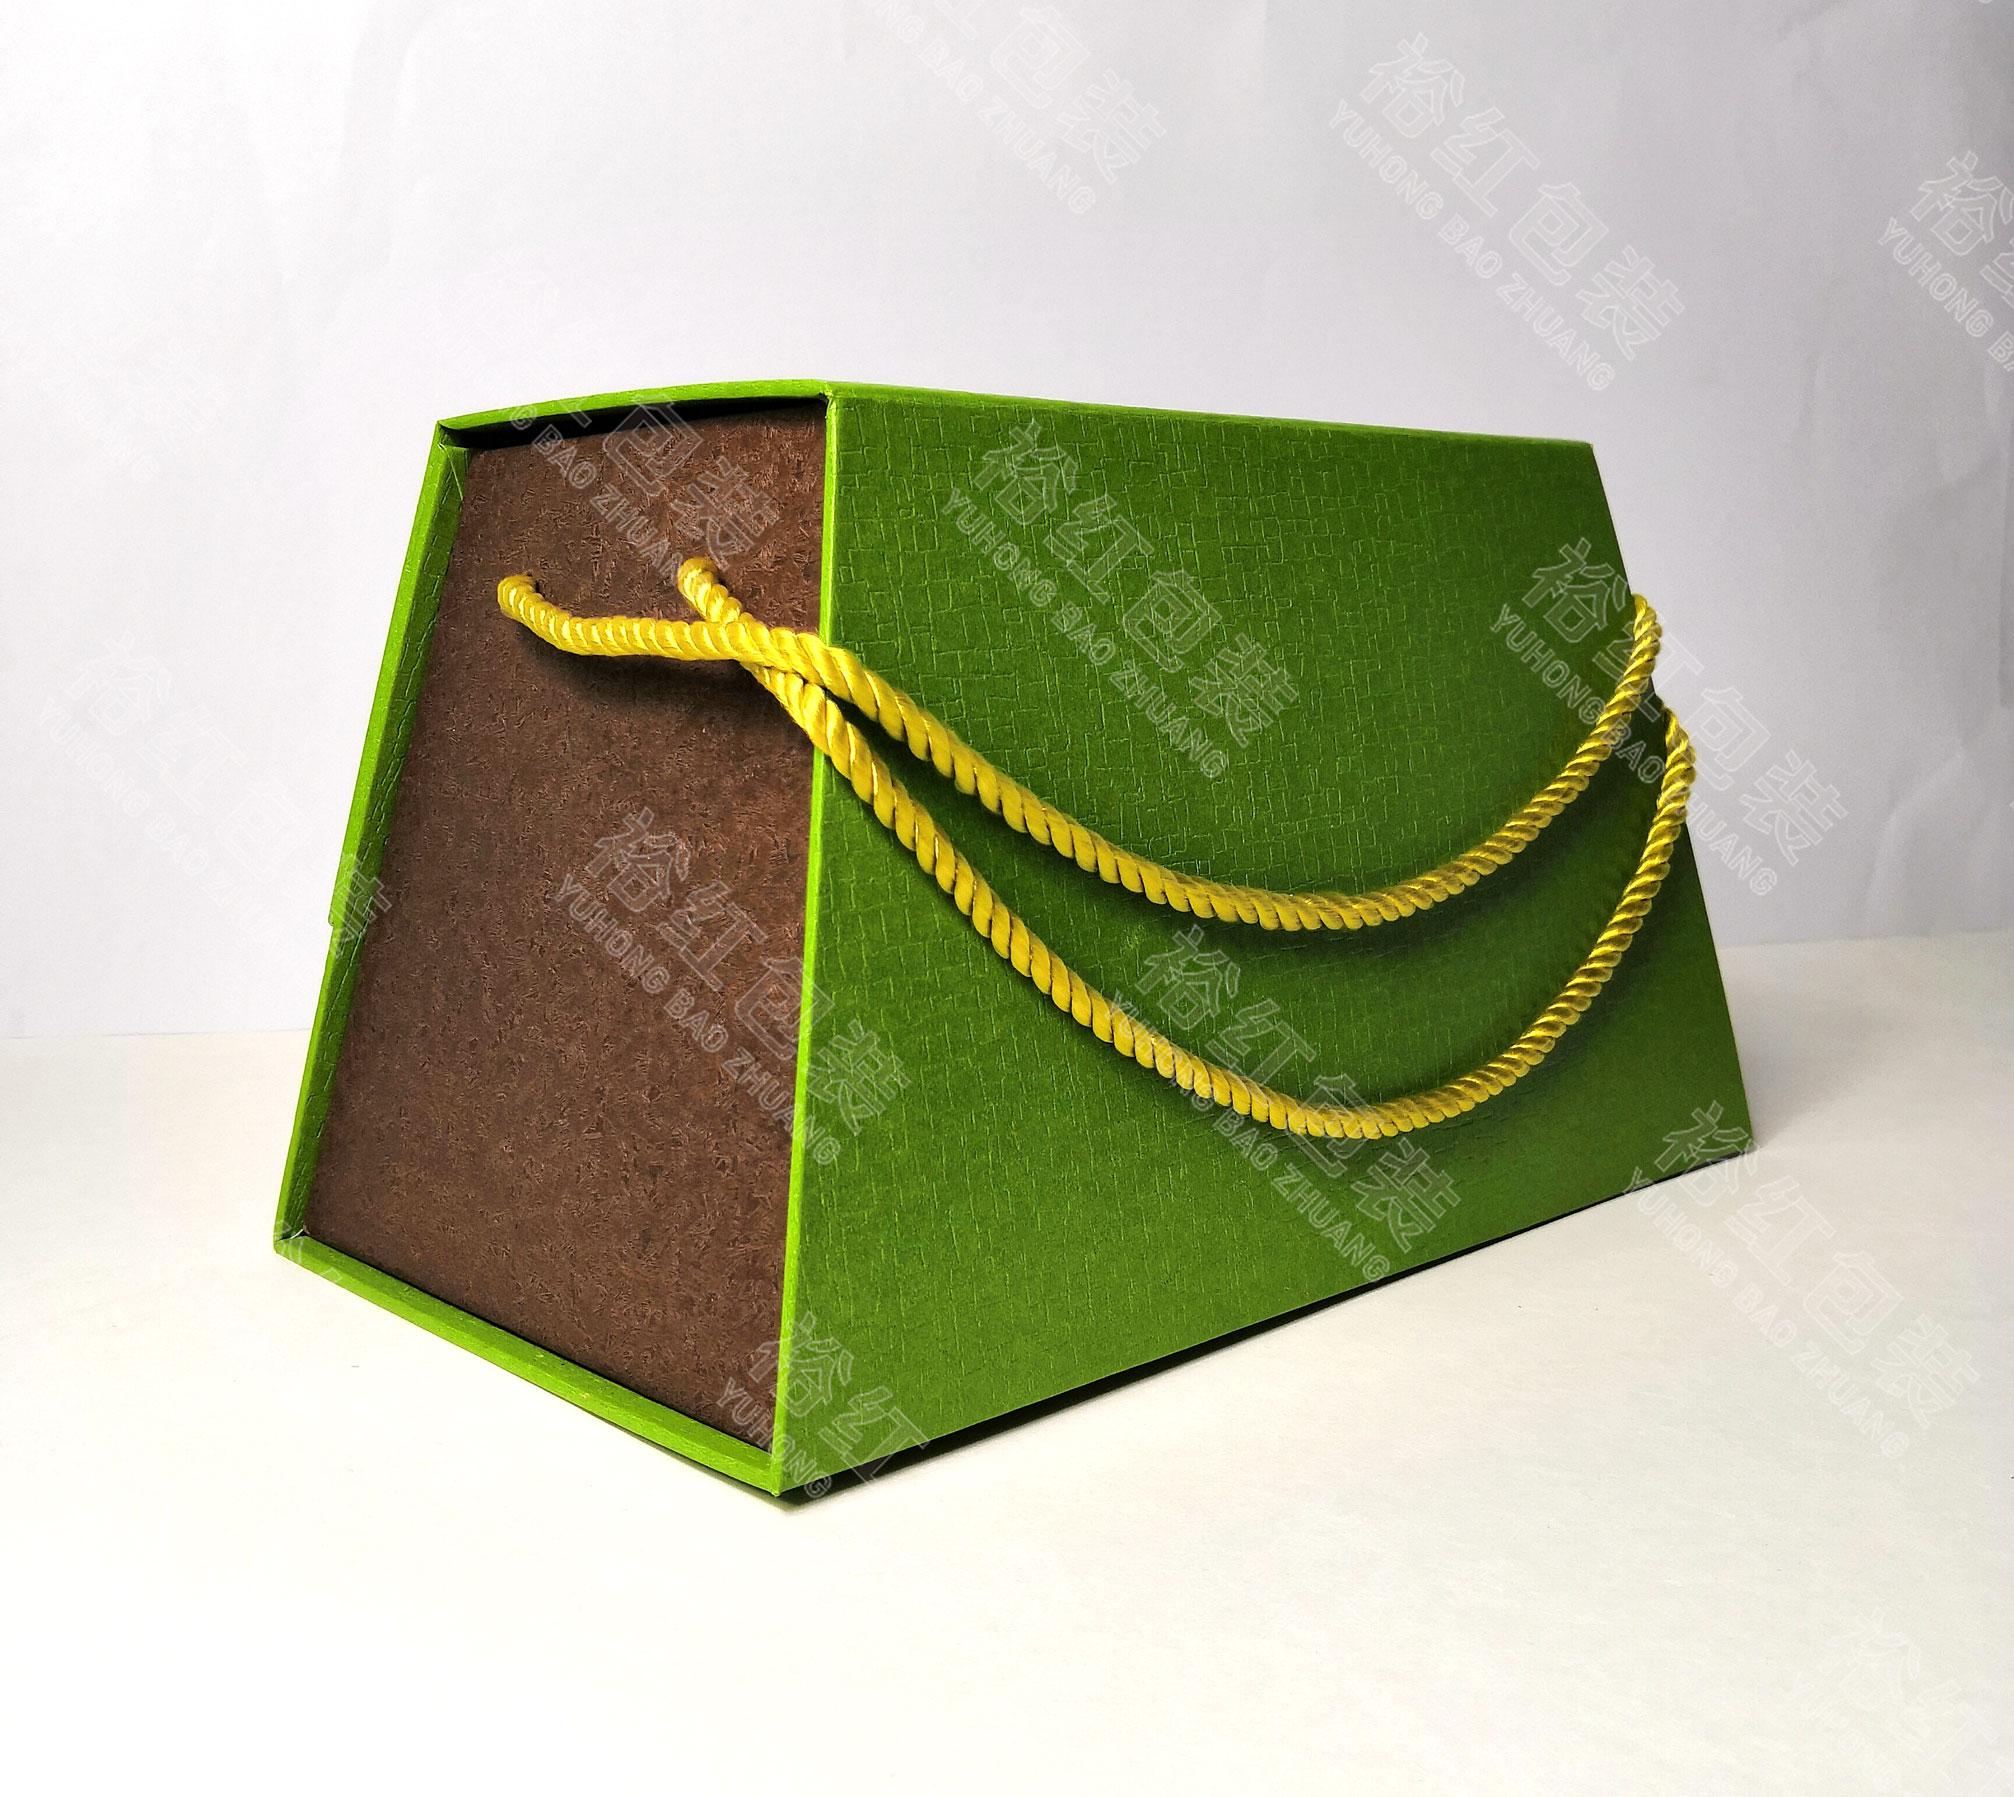 2019款粽子盒